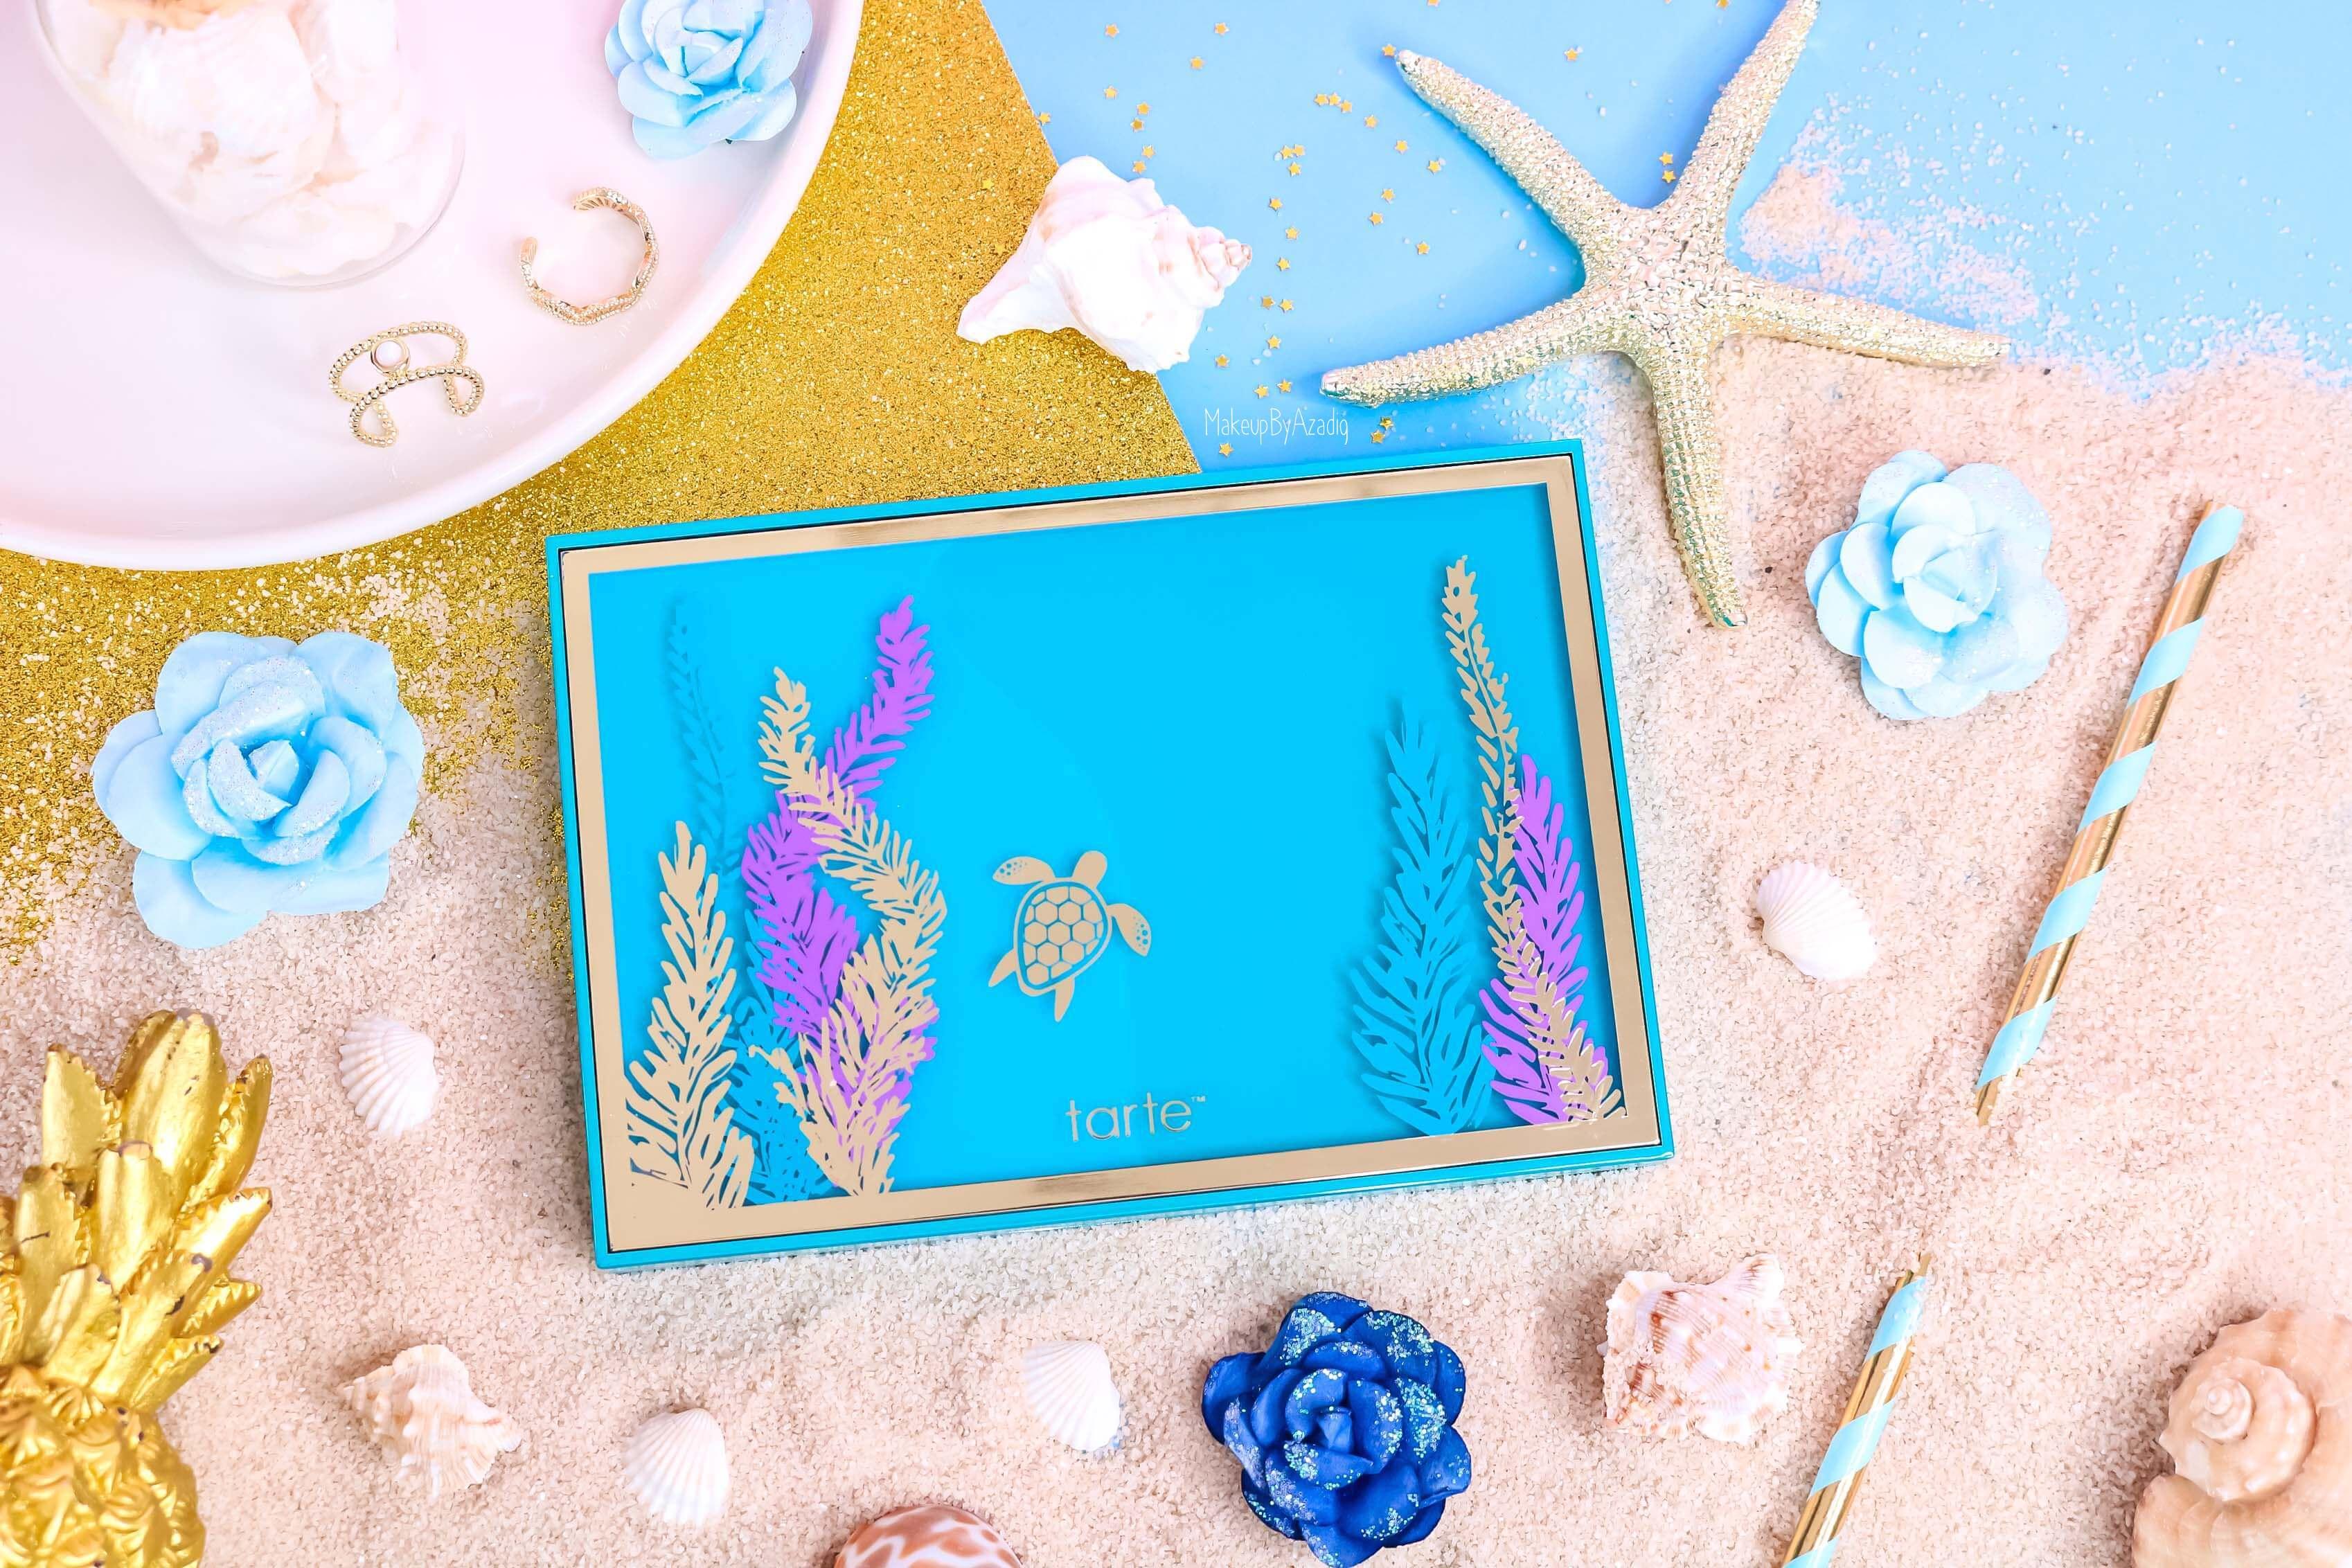 revue-palette-tarte-cosmetics-france-sephora-makeupbyazadig-swatch-prix-avis-rainforest-of-the-sea-tortue